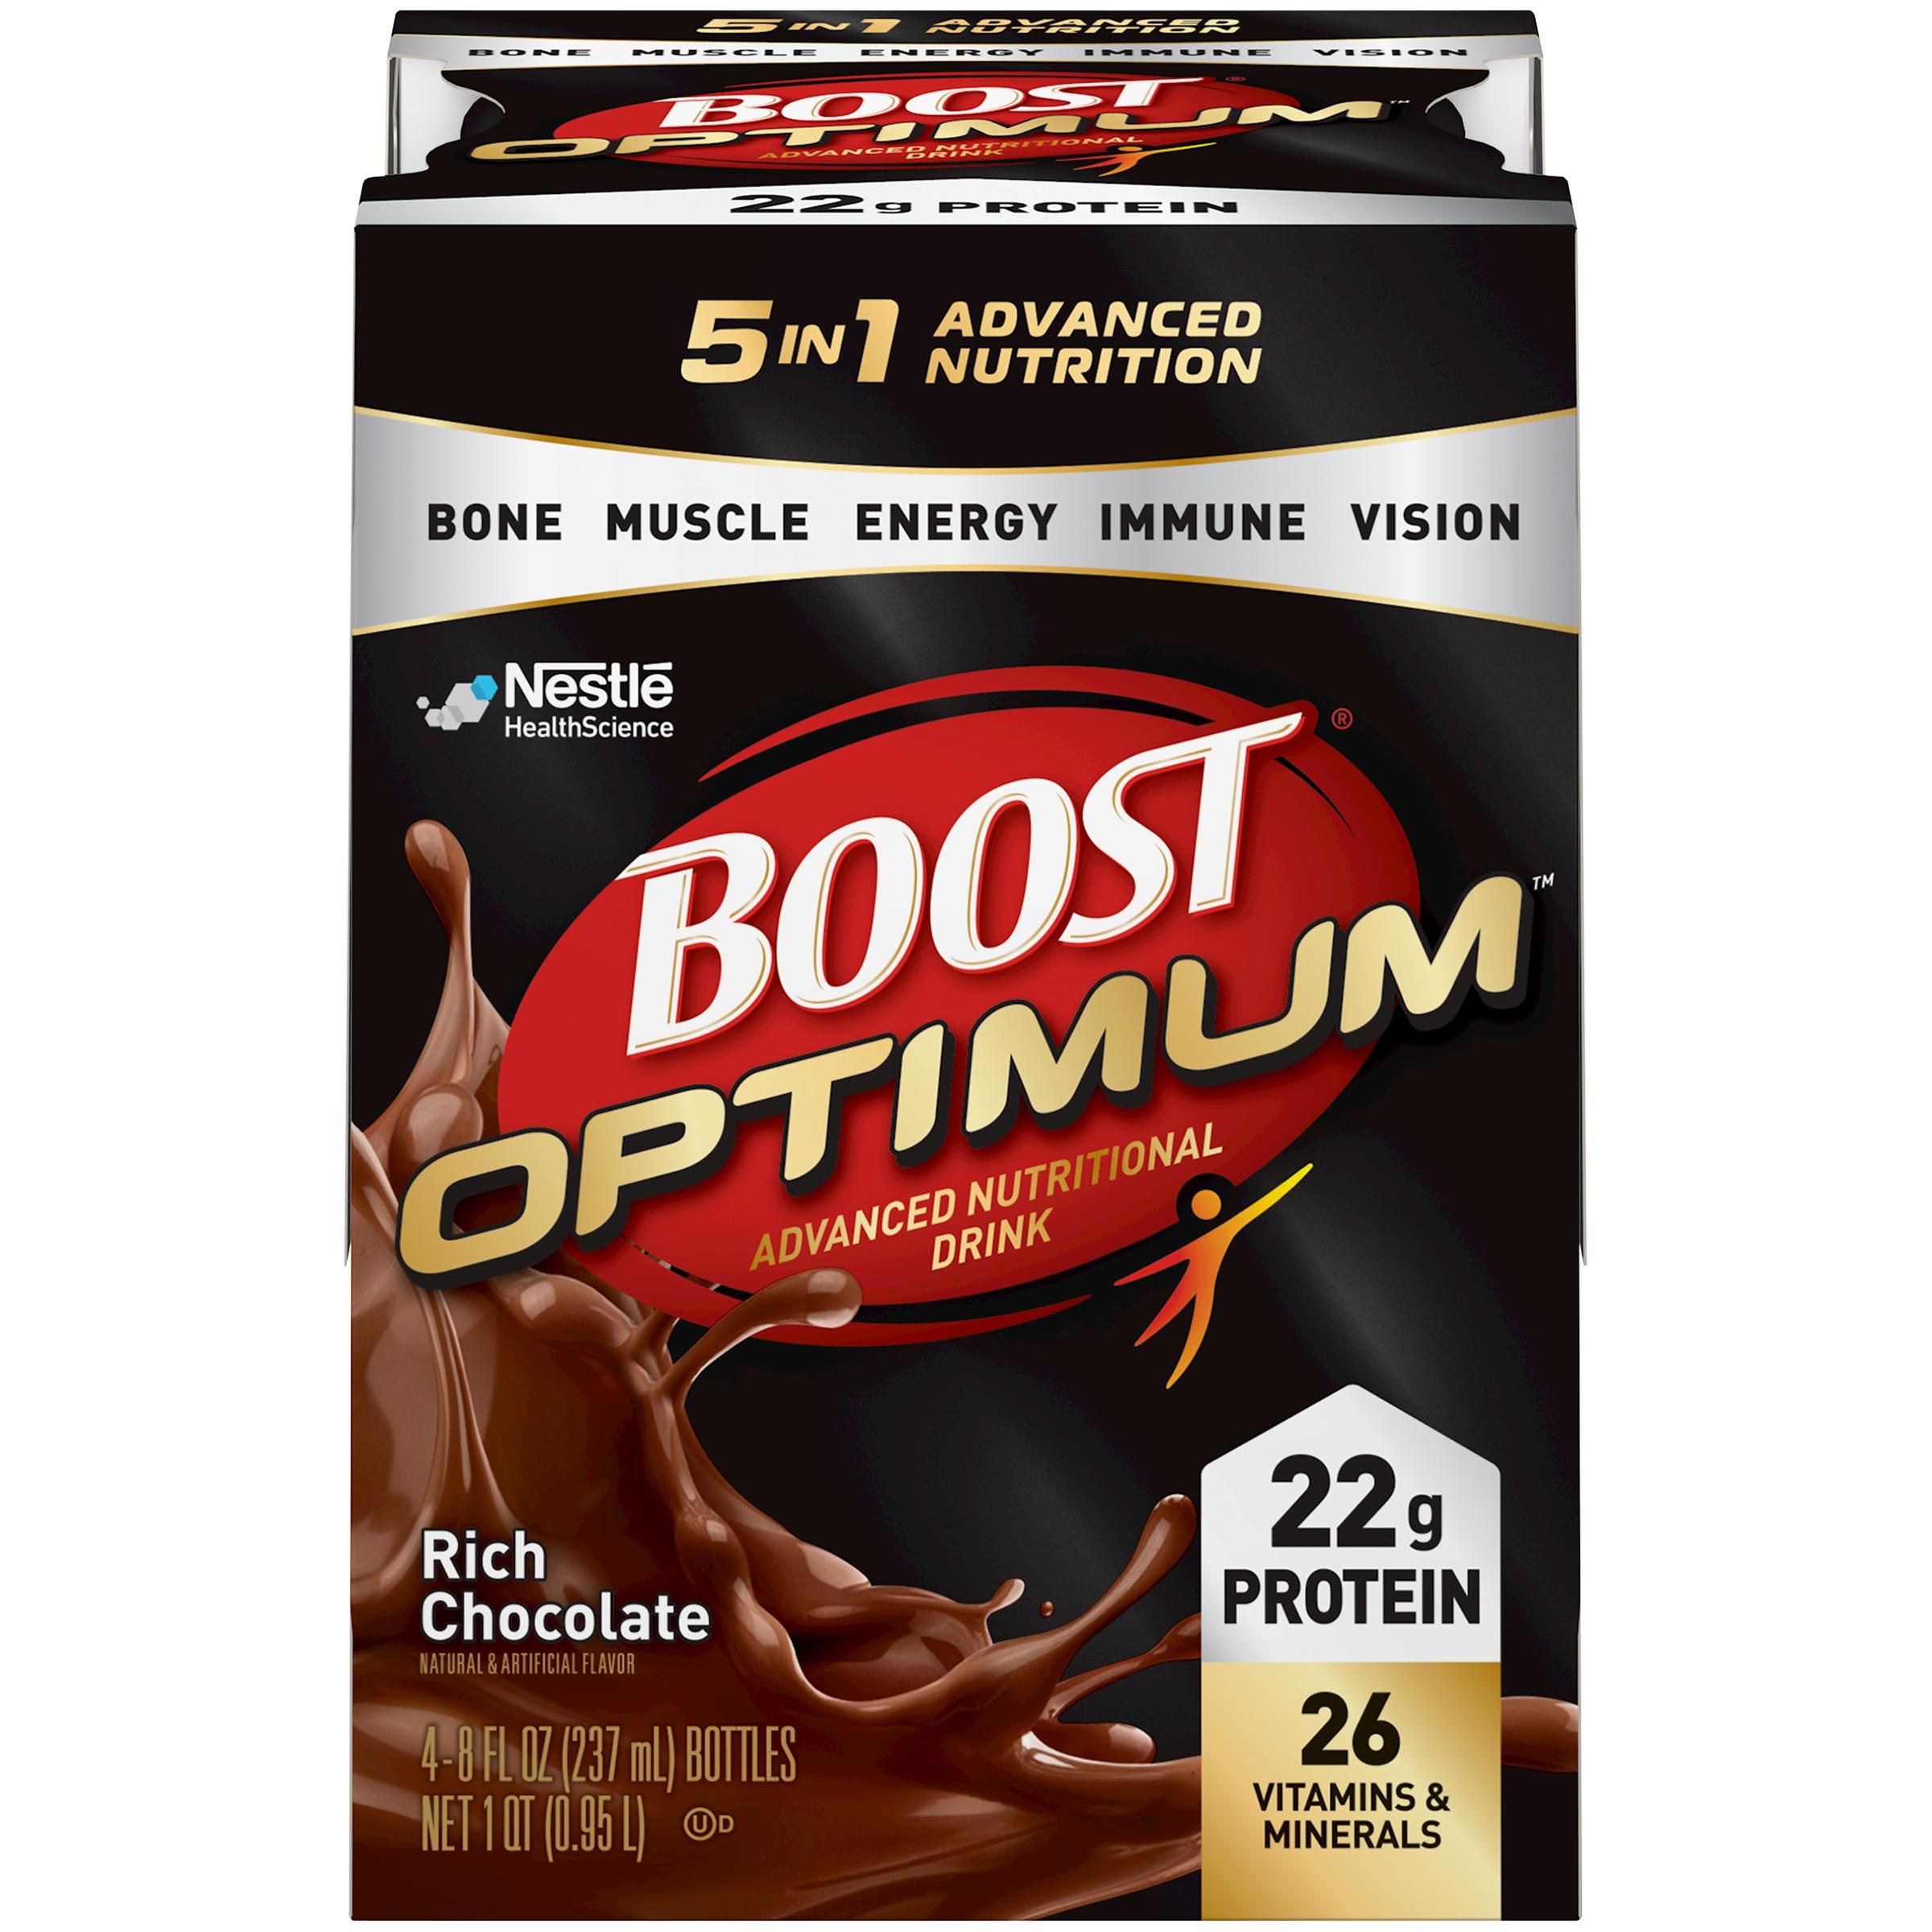 BOOST OPTIMUM Rich Chocolate 4-8 fl. oz. Bottles